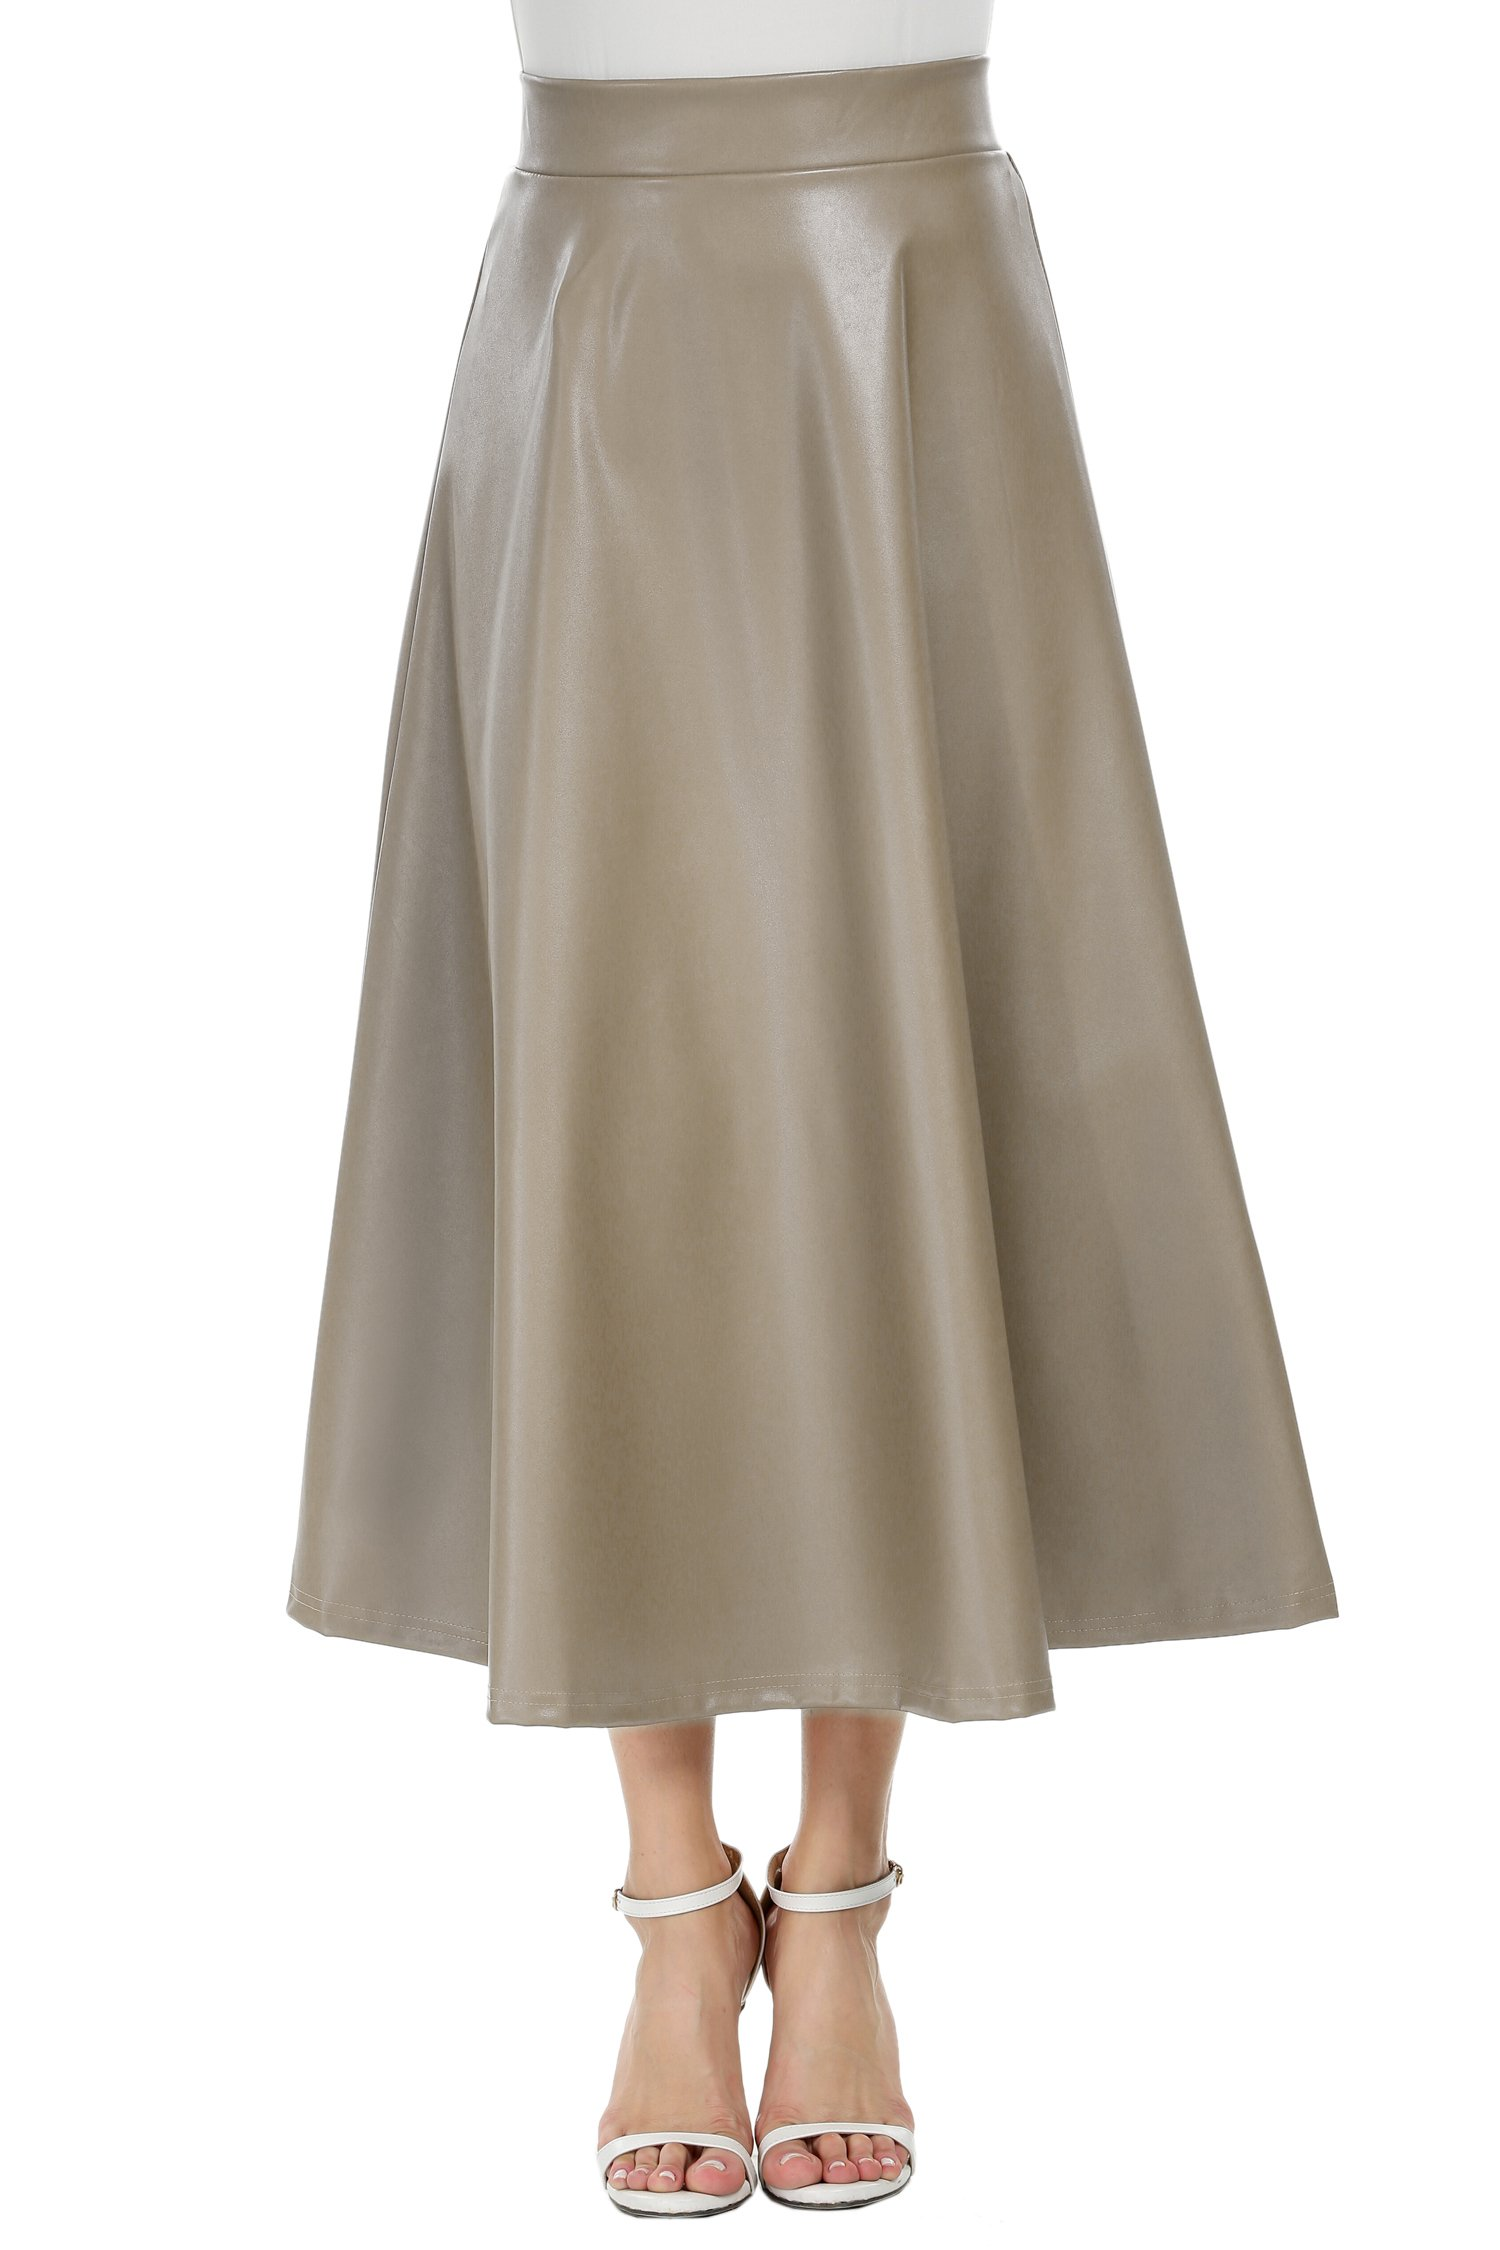 Zeagoo Women's PU Faux Leather High Waist Long Swing Skirt Khaki XXL